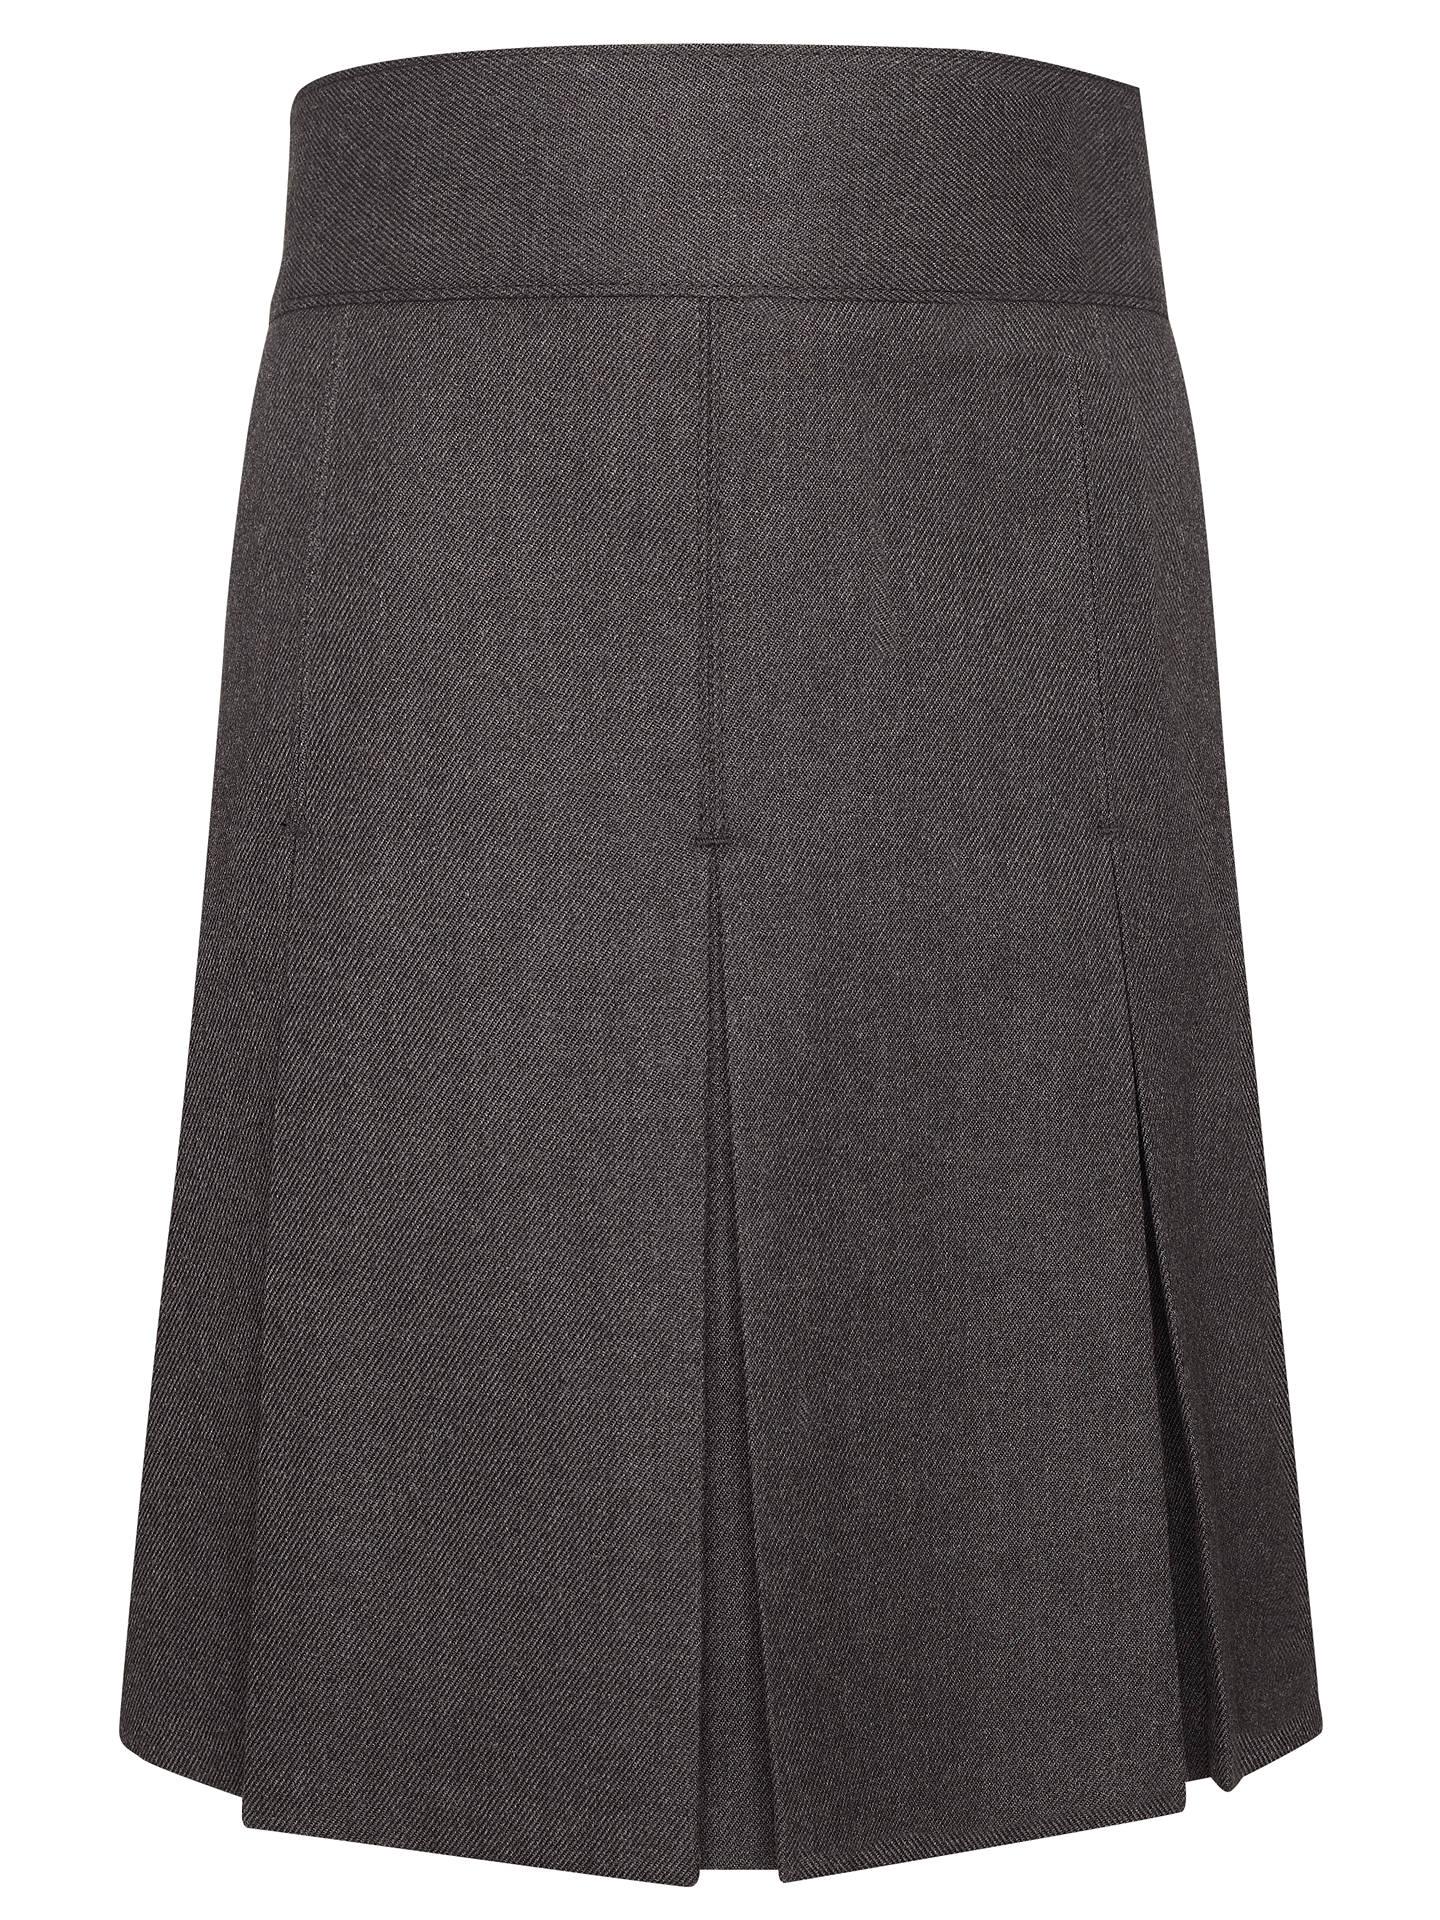 41ac78a8c6 Buy John Lewis & Partners Girls' Adjustable Waist Stitch Down Pleated  School Skirt, Grey ...